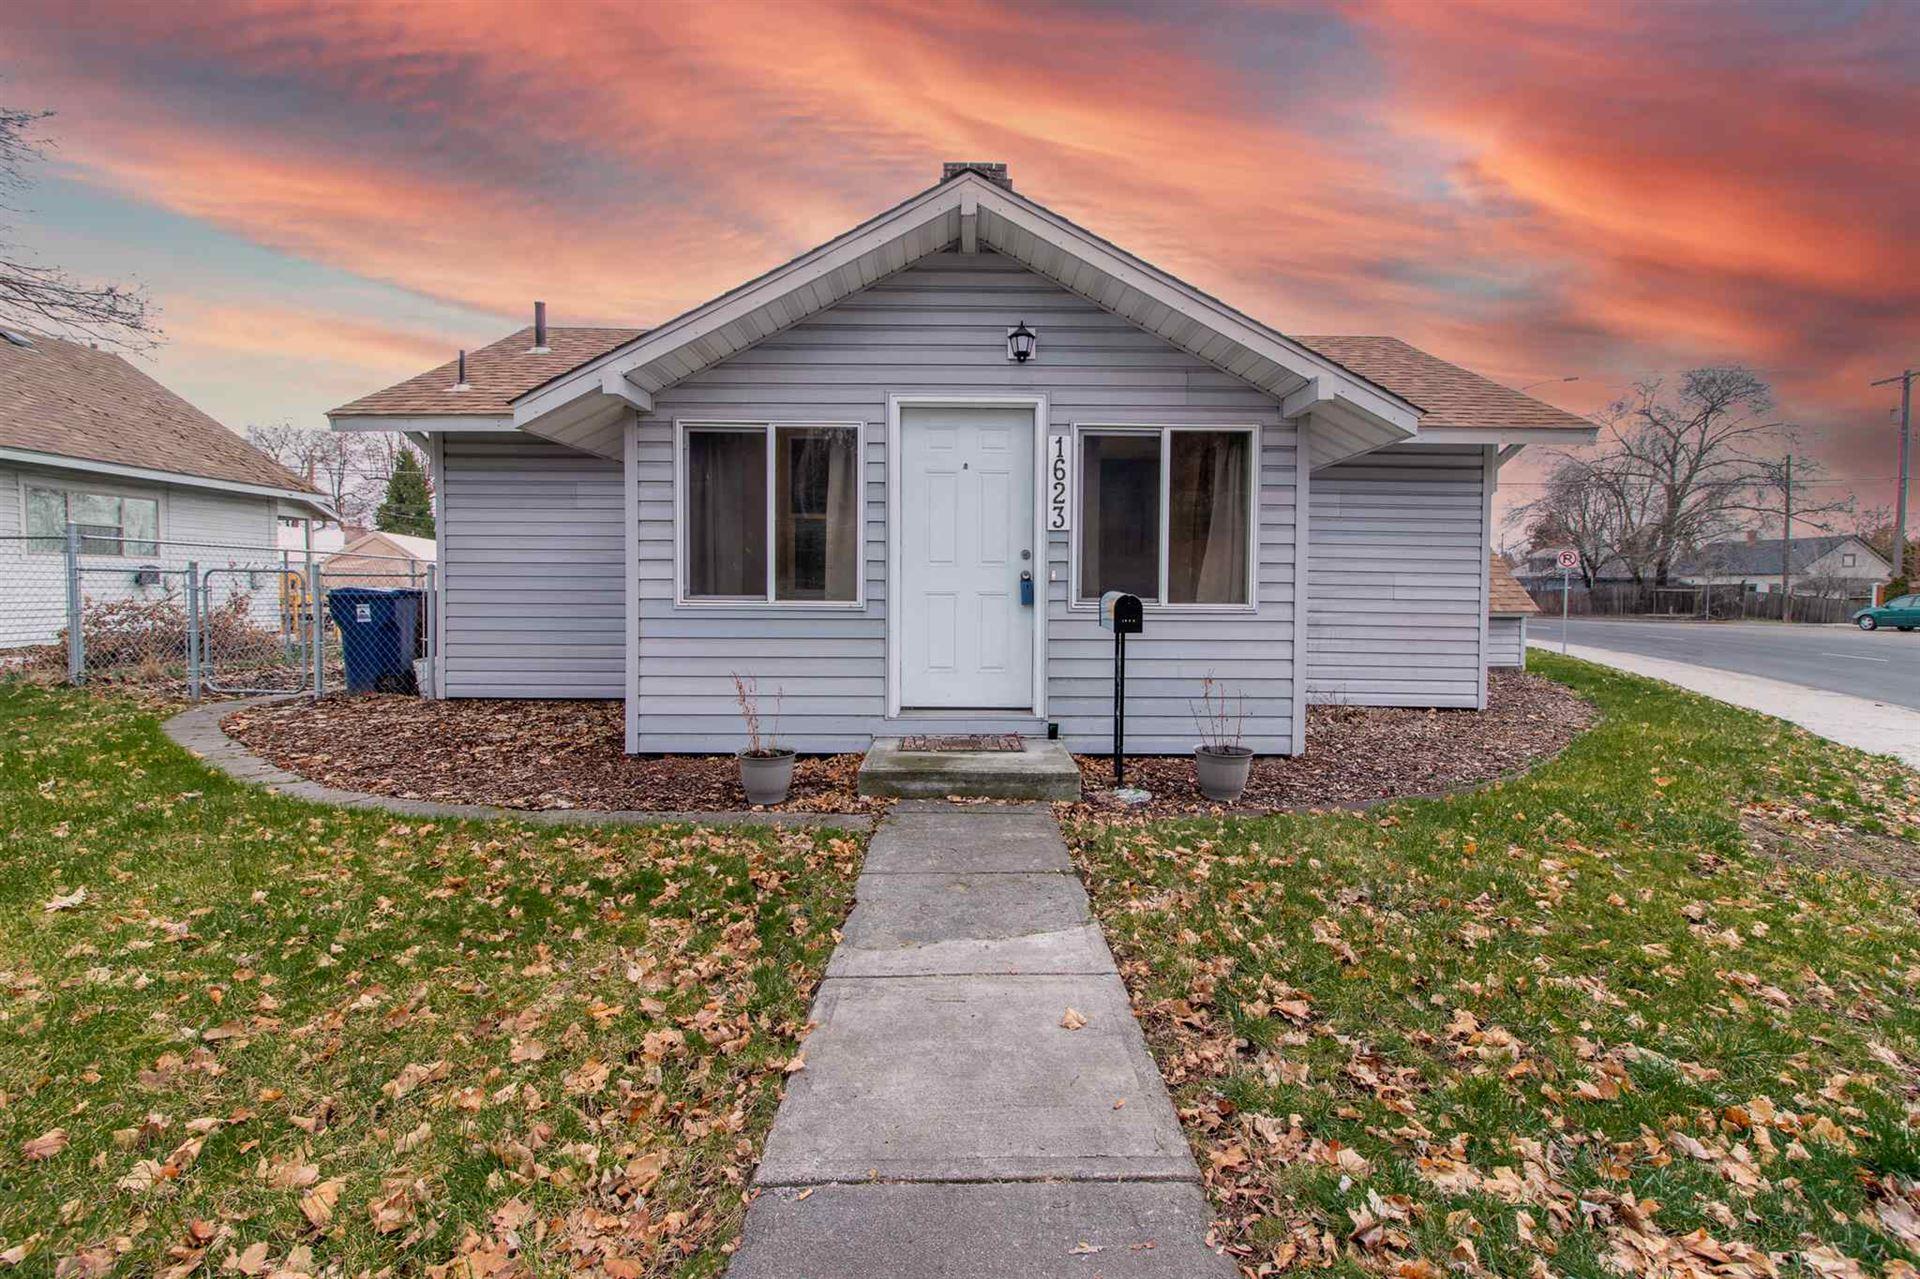 1623 W Fairview Ave, Spokane, WA 99205 - #: 202110434